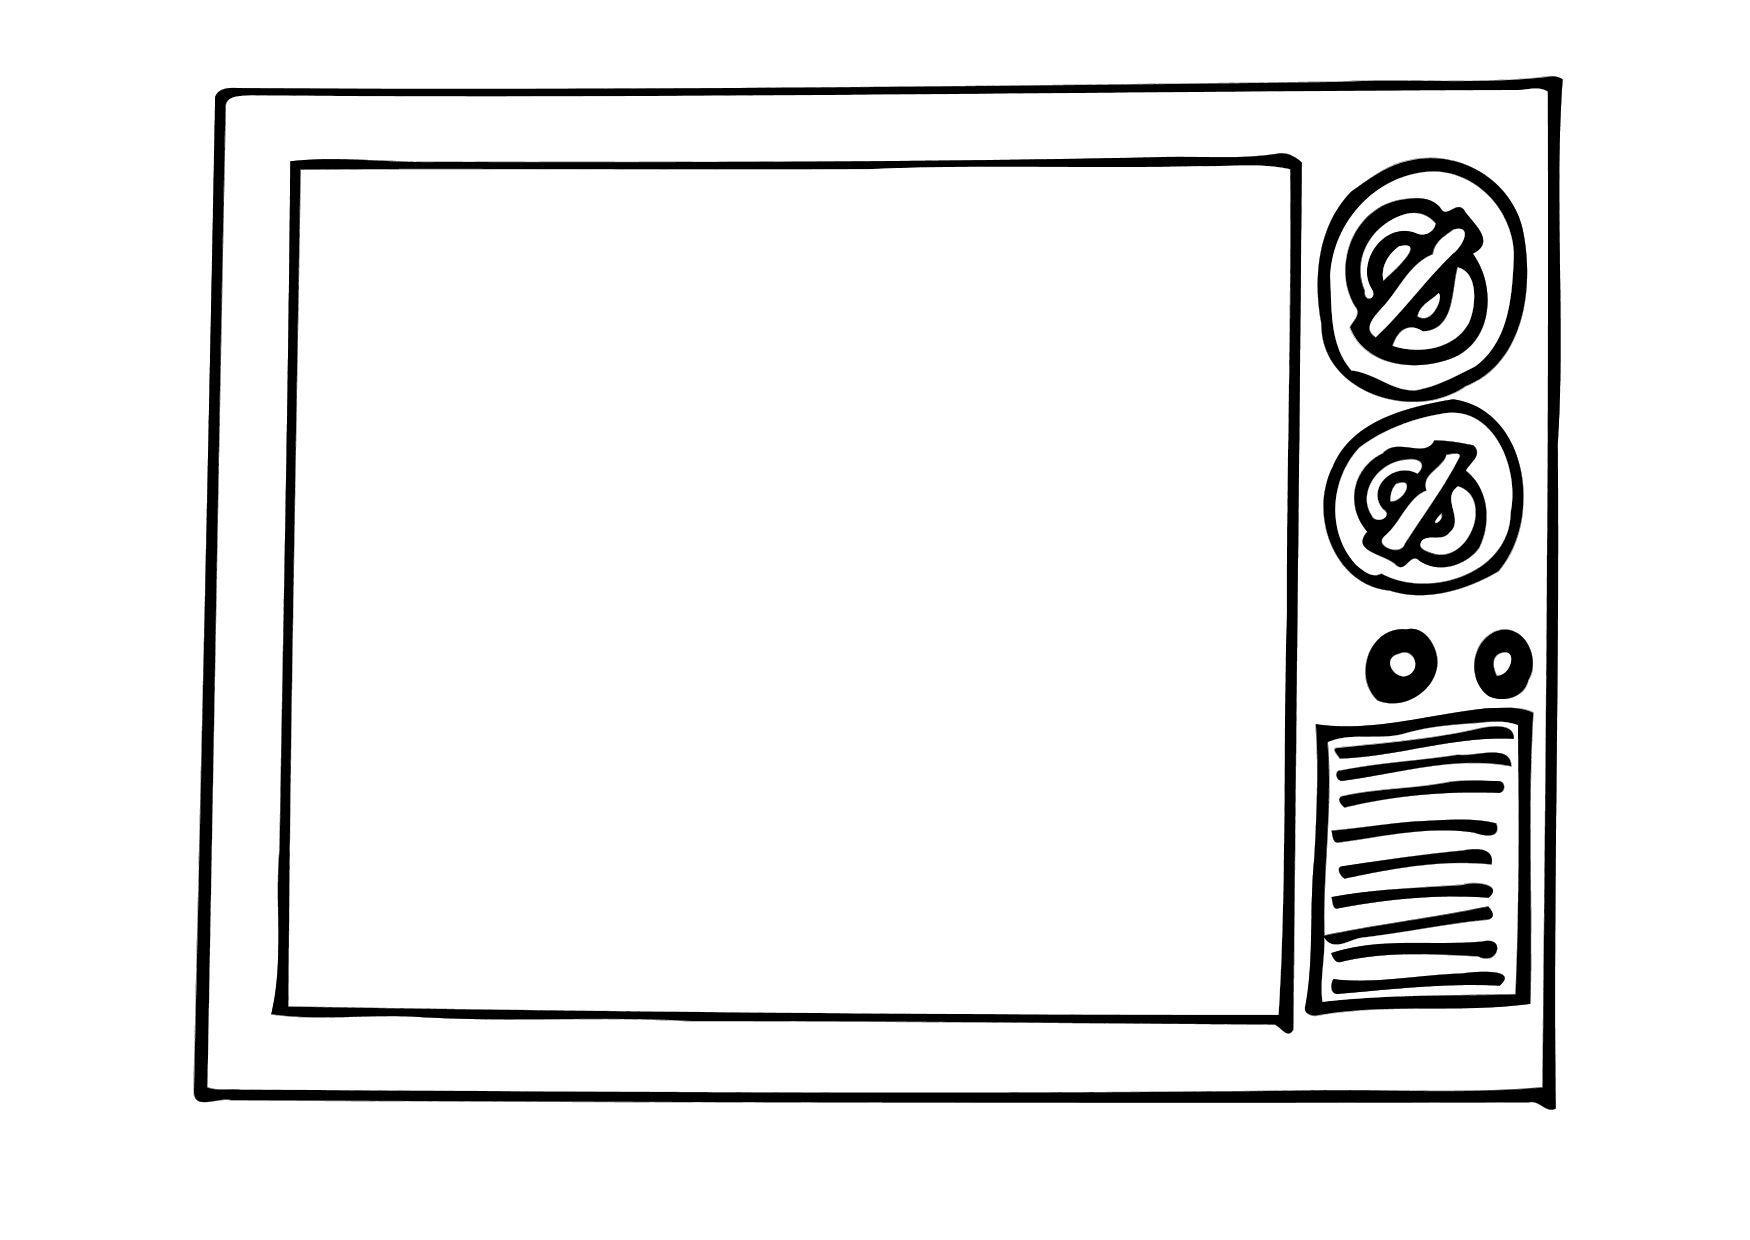 Malvorlage fernseher ausmalbild 12296 - Programa para pintar ...